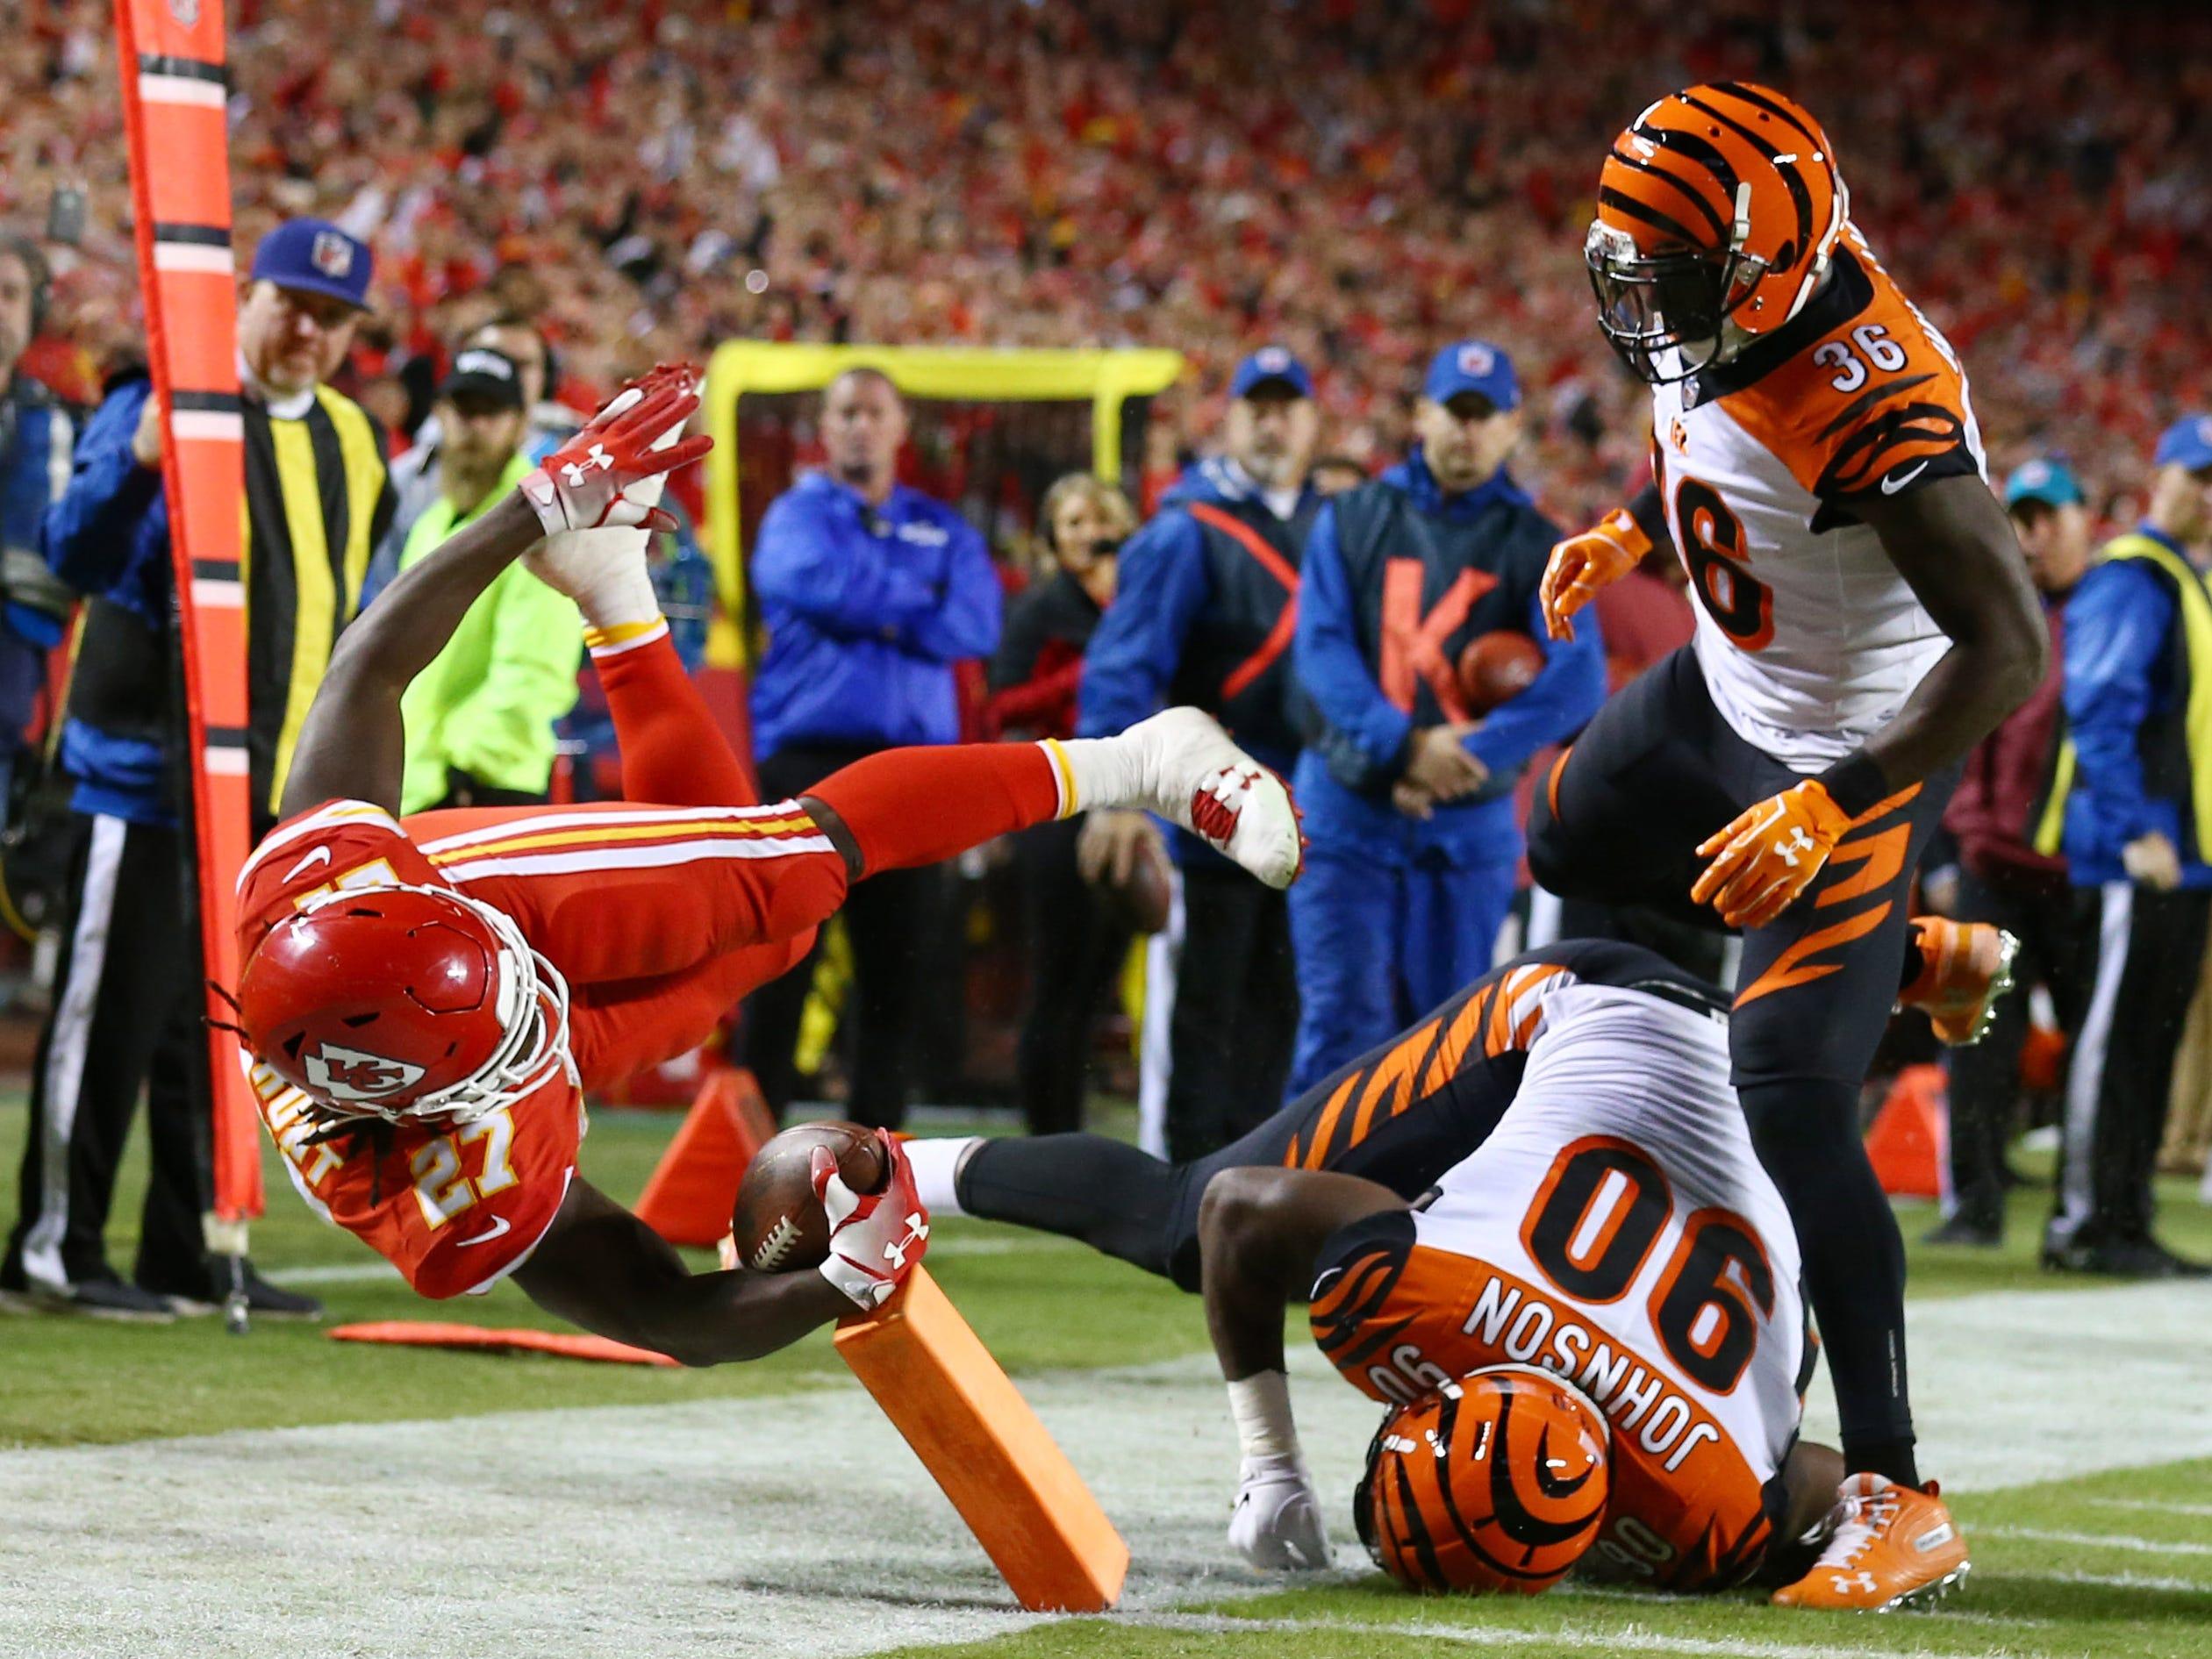 Week 7: Kansas City Chiefs running back Kareem Hunt dives for a touchdown against the Cincinnati Bengals at Arrowhead Stadium.